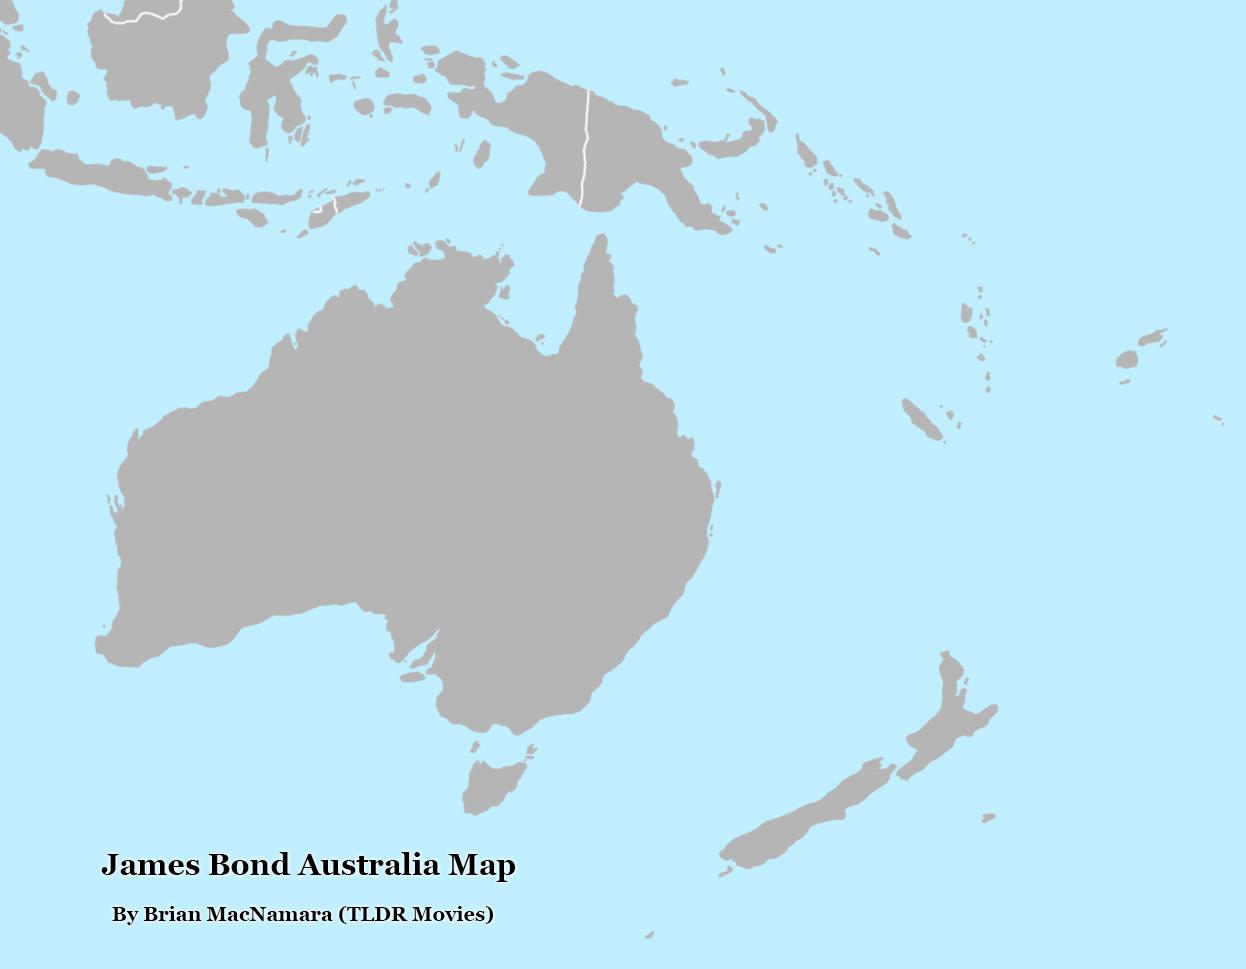 James Bond Australia Map.